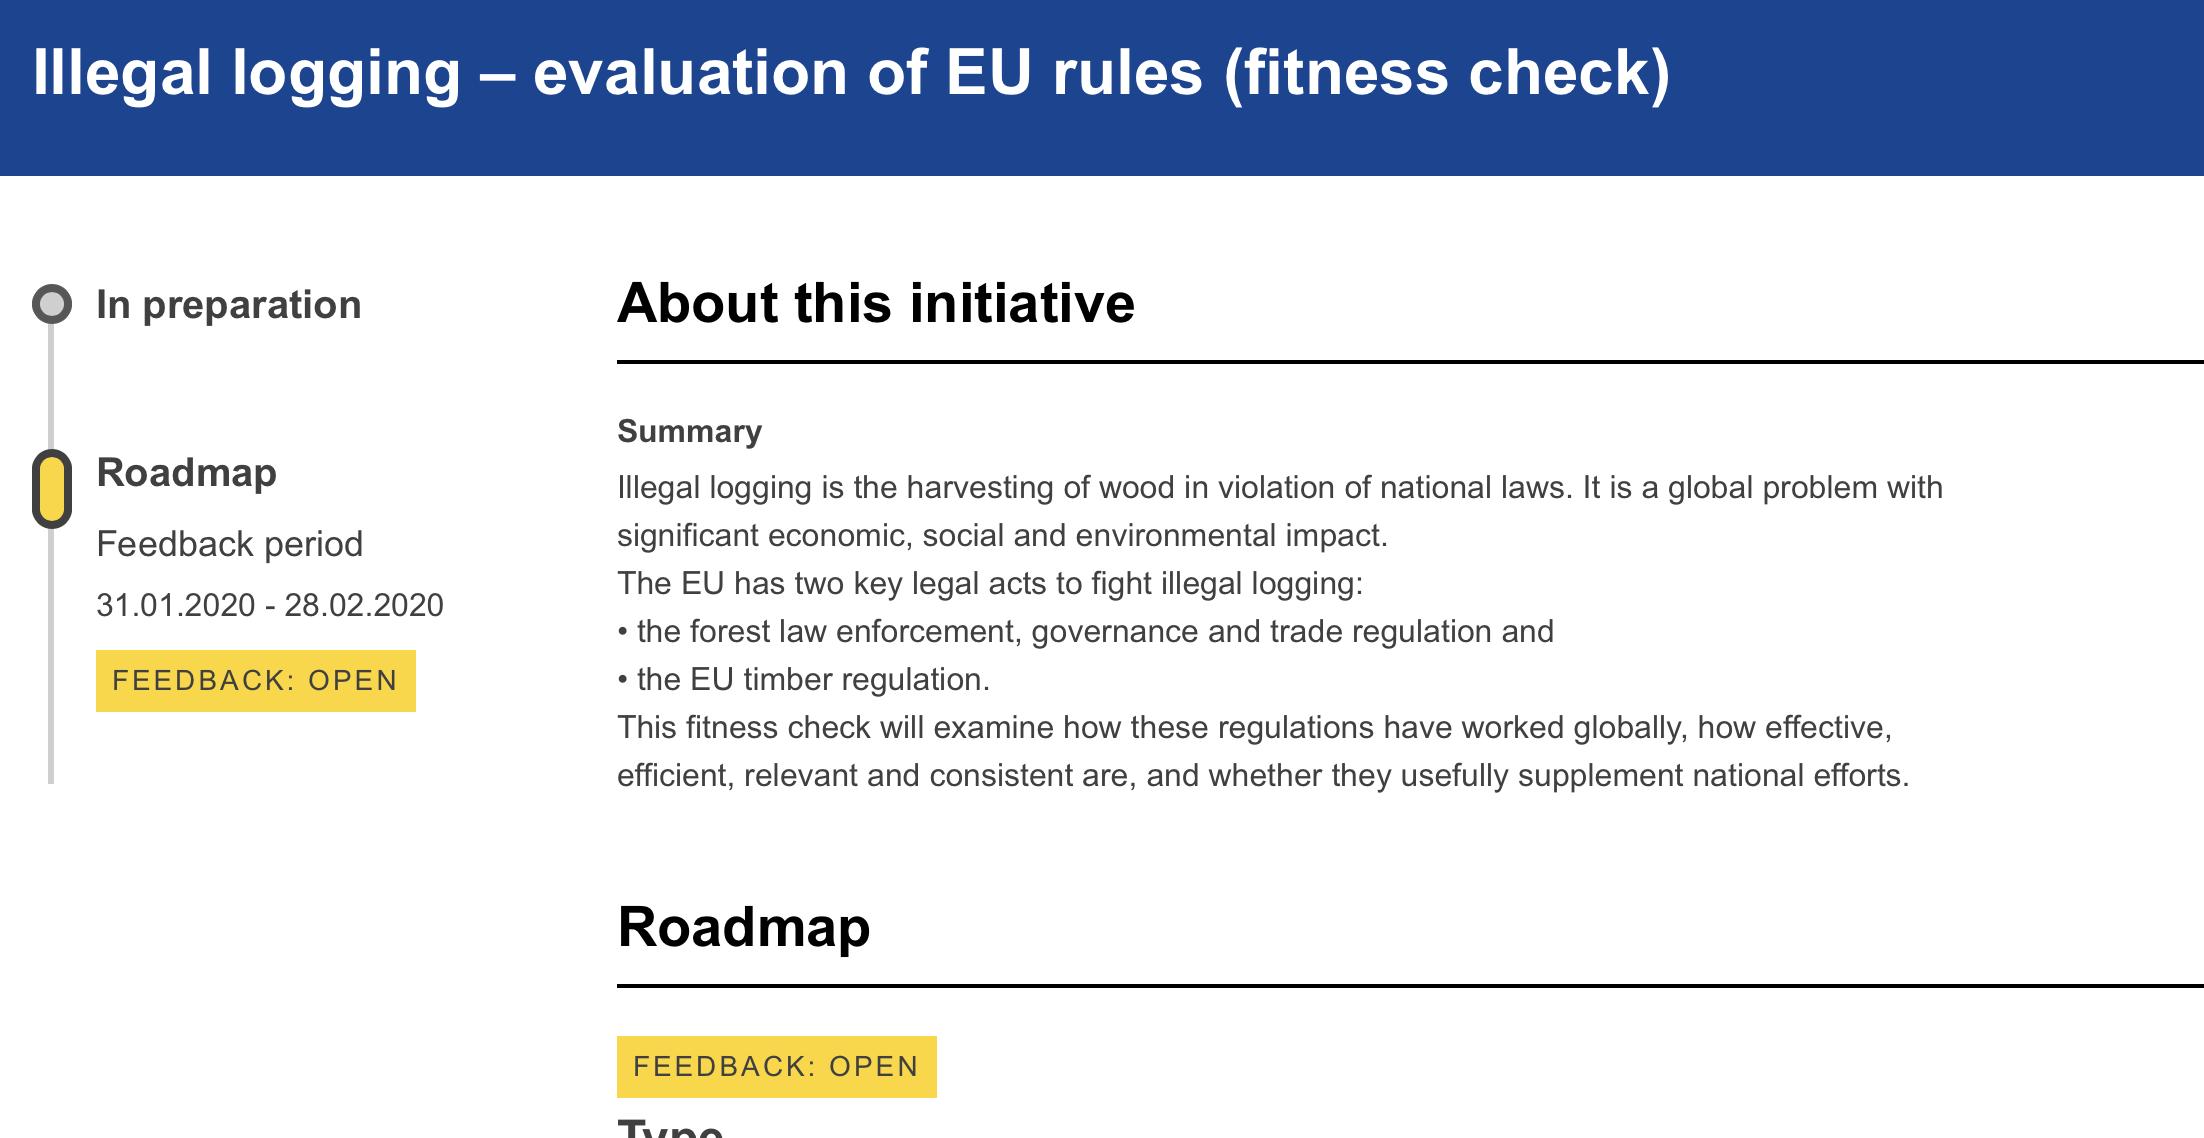 EU invites feedback on EUTR and FLEGT Regulations